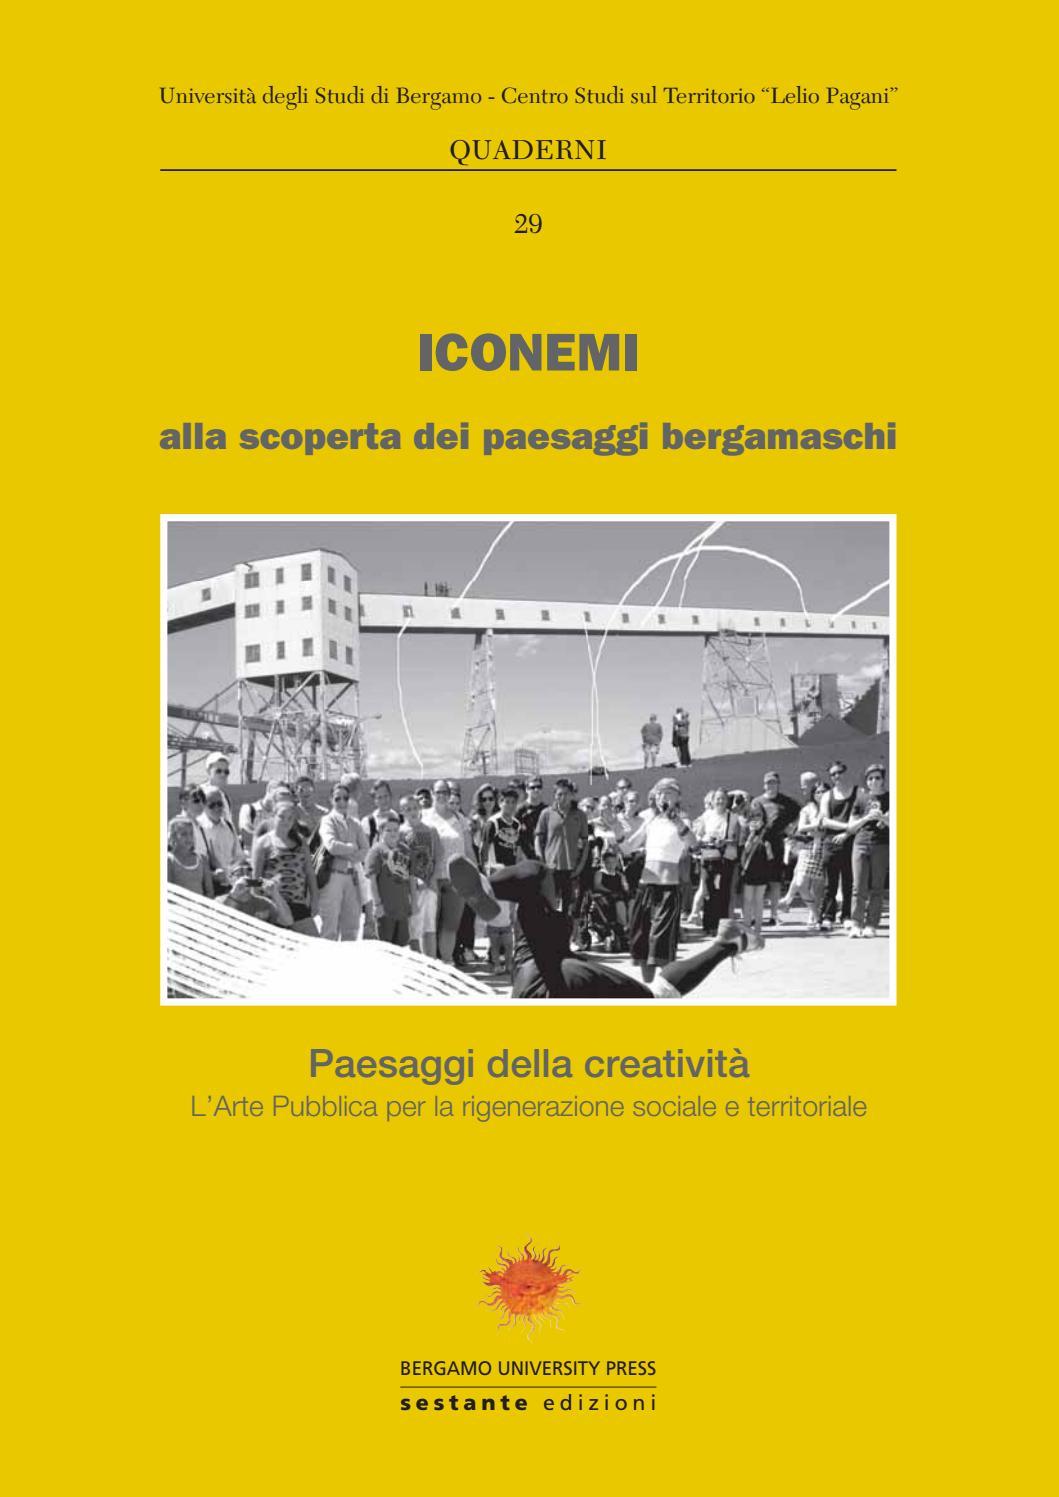 Iconemi2016 PAESAGGI DELLA CREATIVITA  by CentroStudiTerritorio LelioPagani  - issuu 5af5afb63